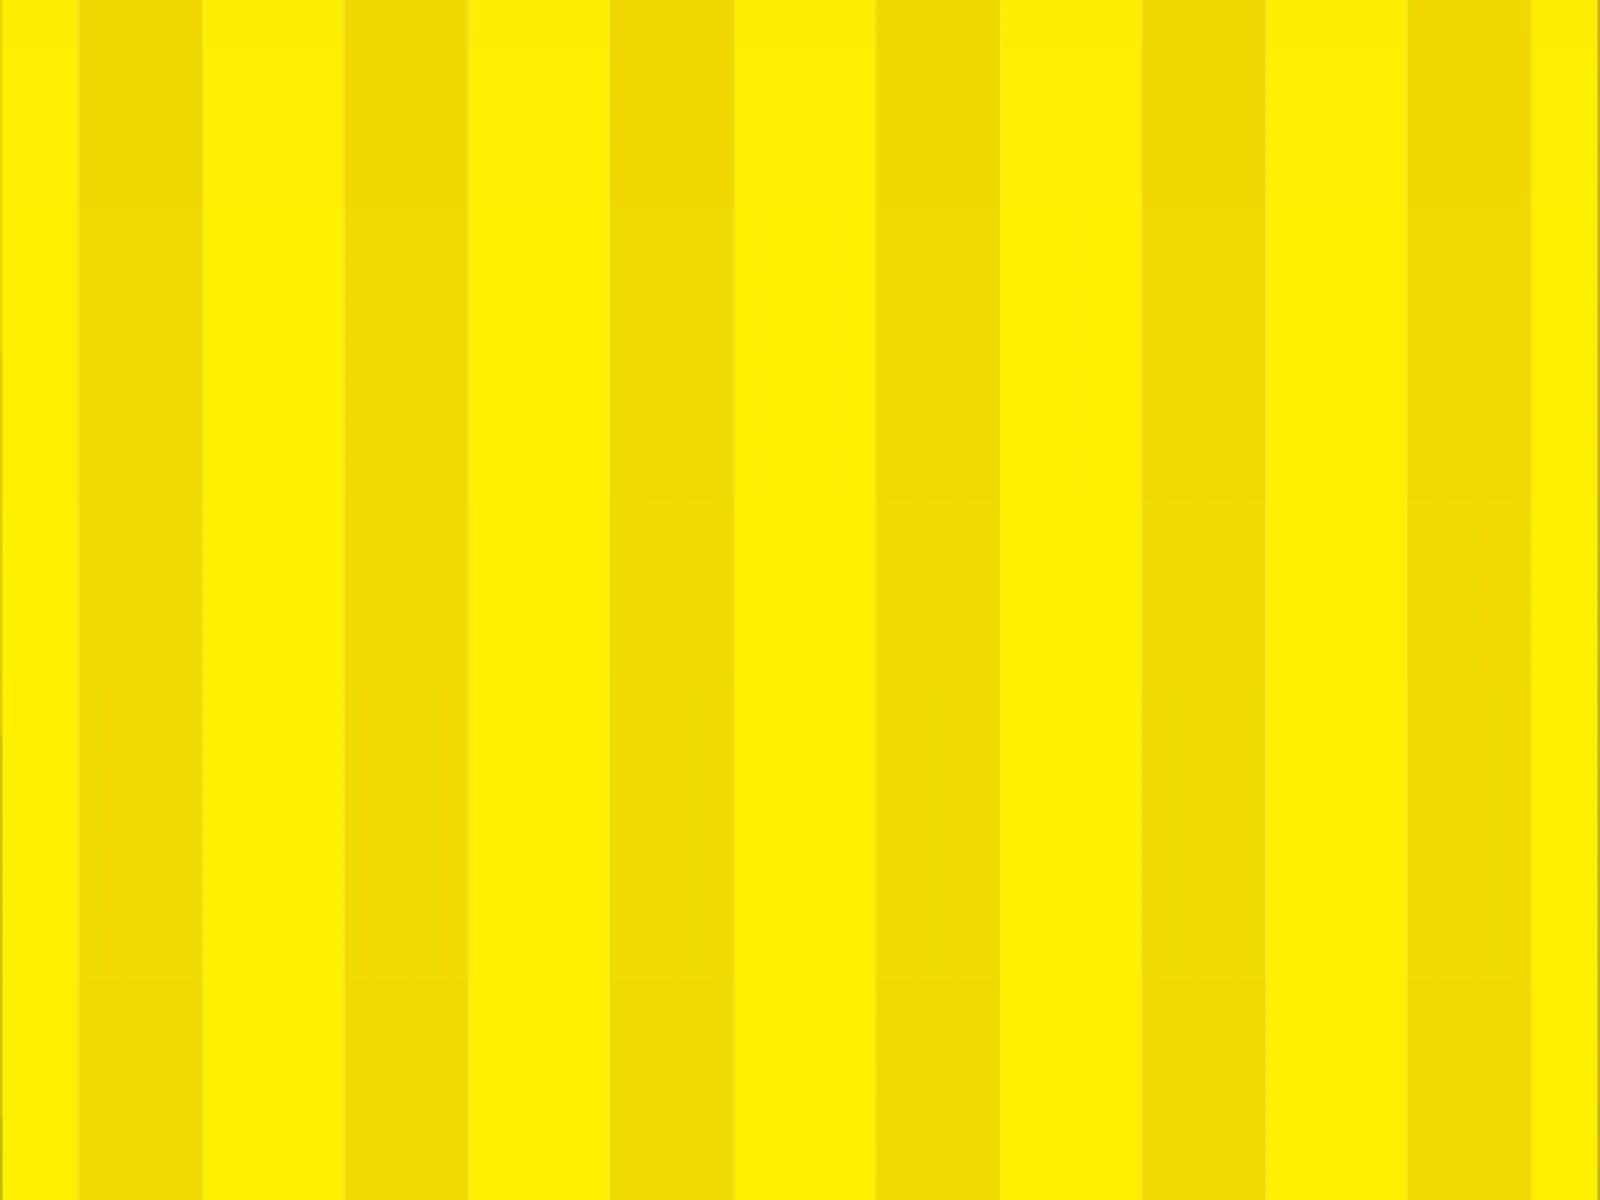 Free Yellow Wallpaper